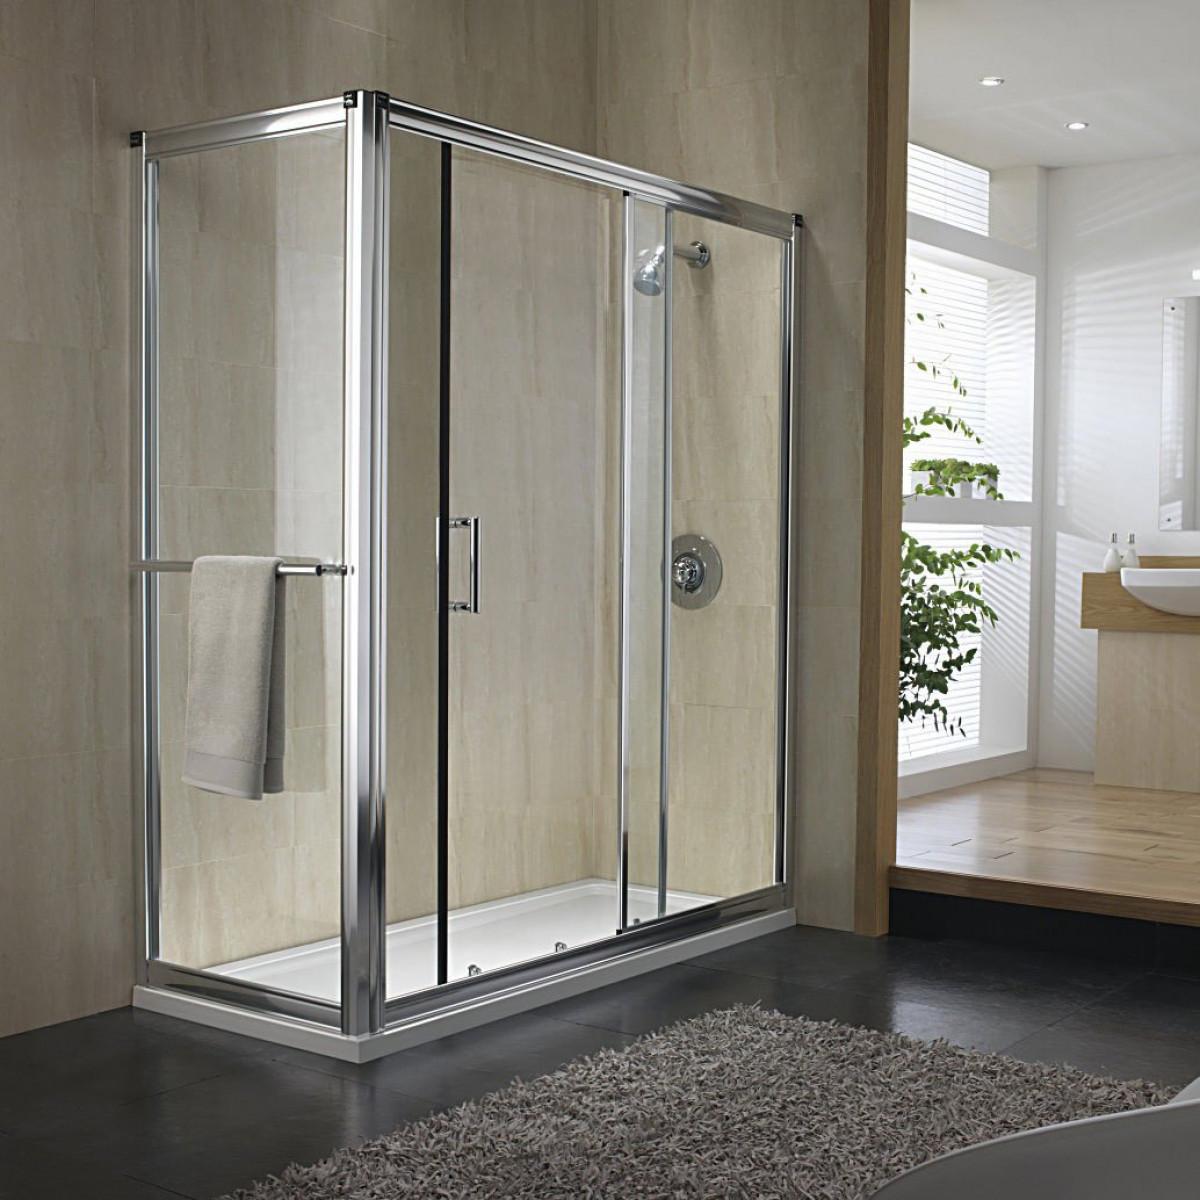 Twyford hydr8 1200mm sliding shower door h88500cp for 1200mm shower door